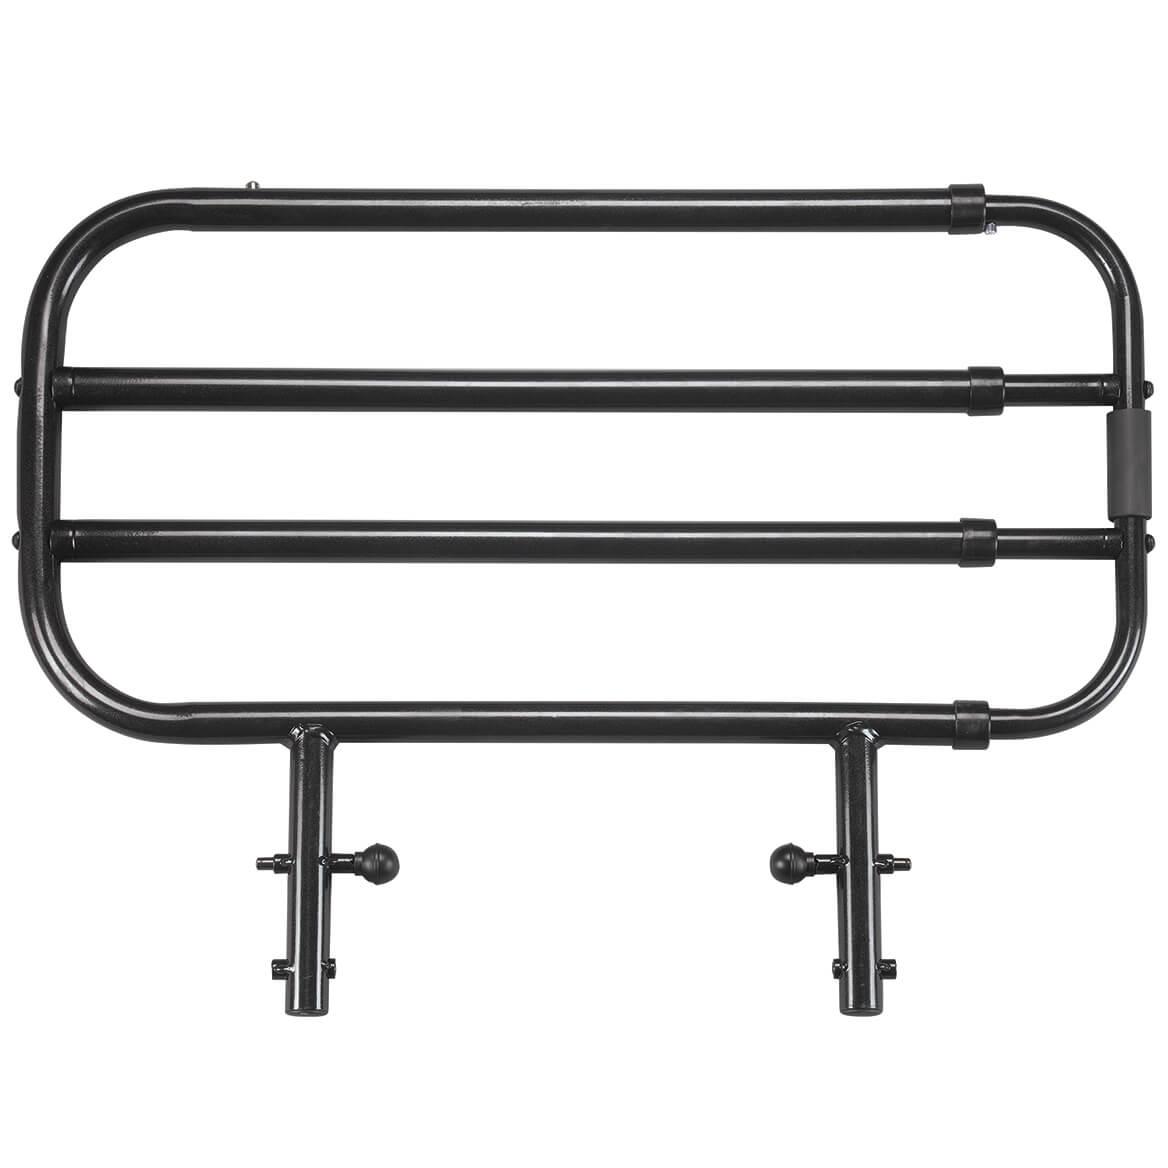 EZ Adjust Bed Rail                        XL-335231